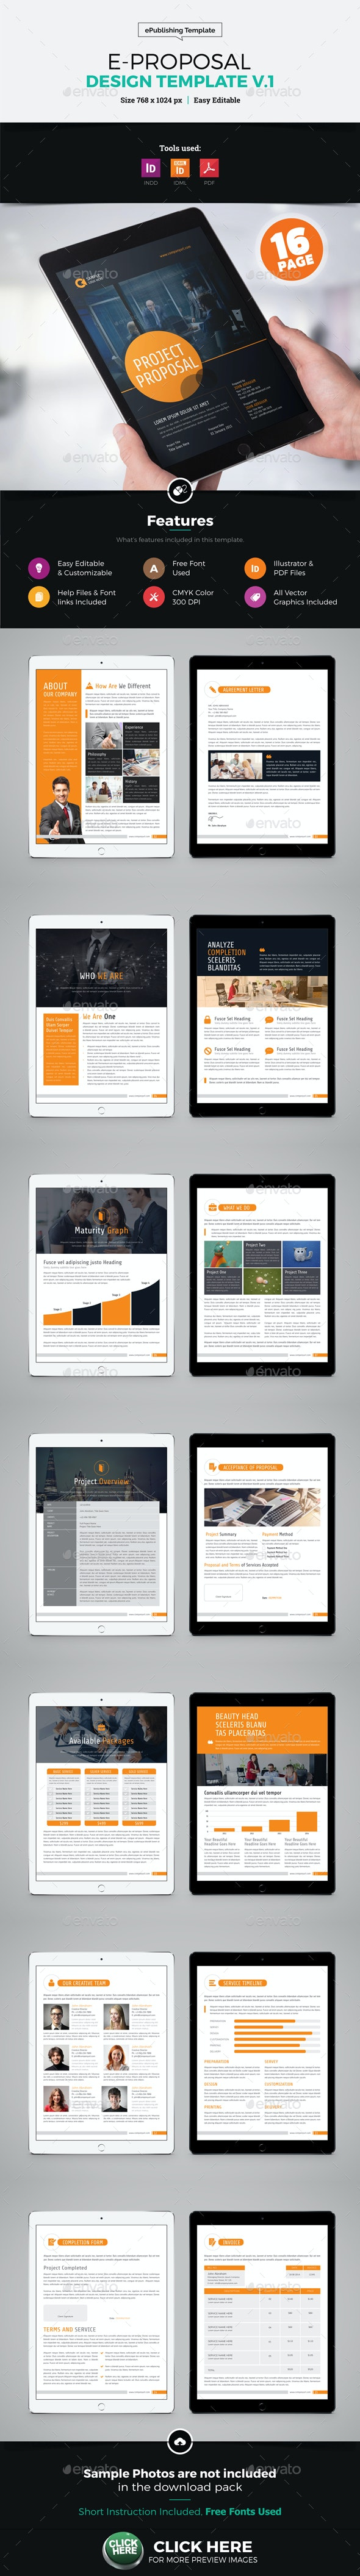 E-Proposal Design - Digital Books ePublishing